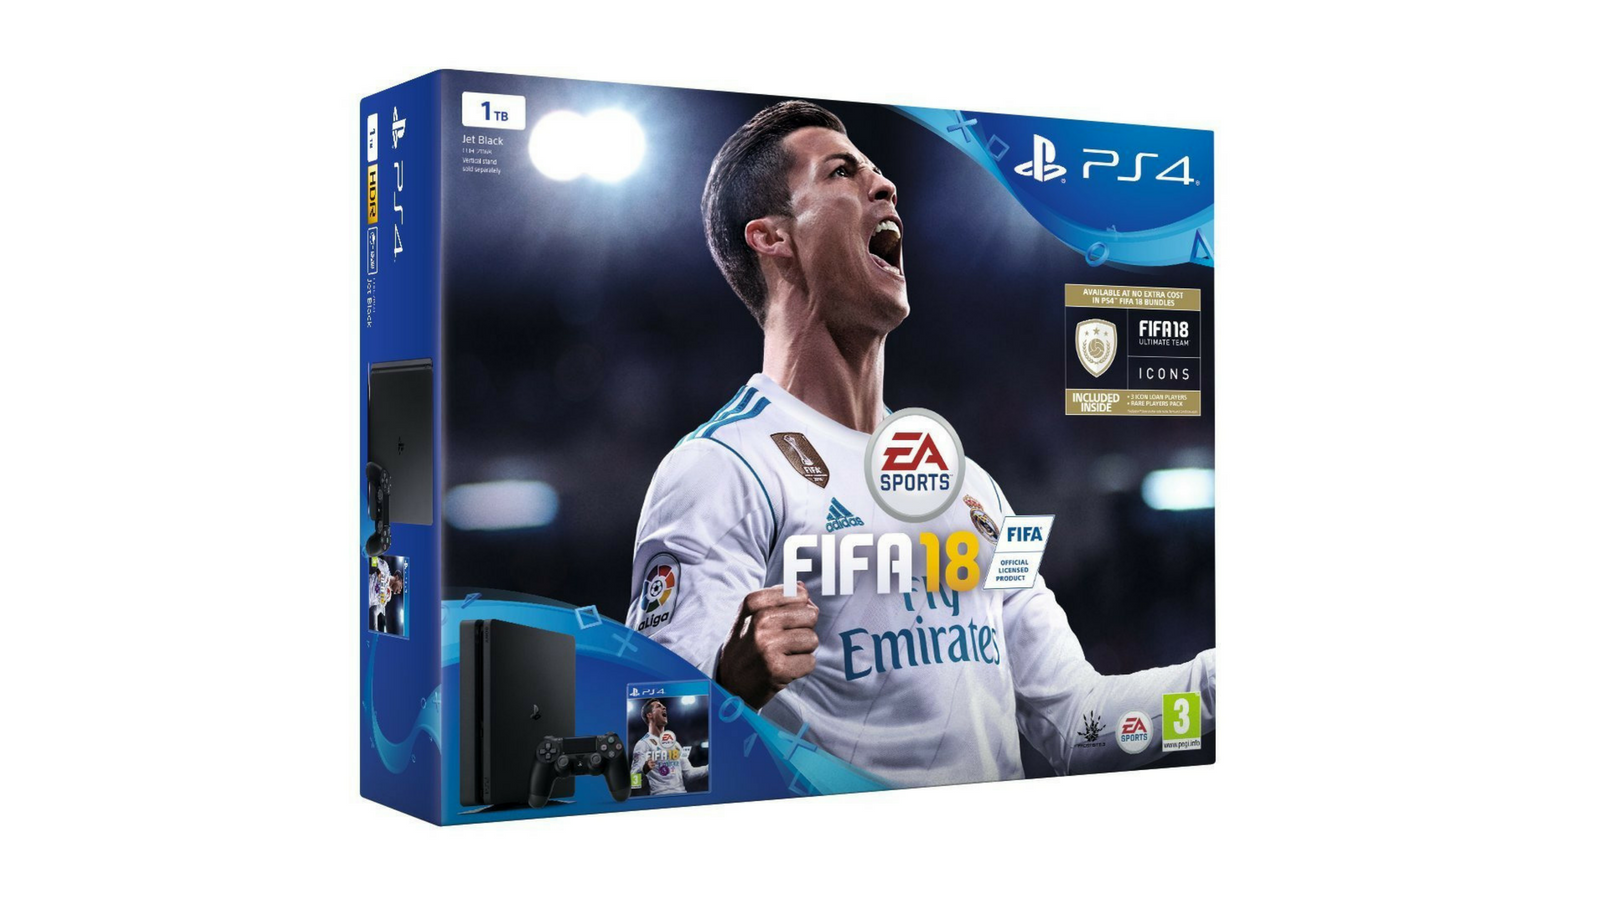 Deals on ps4 games uk